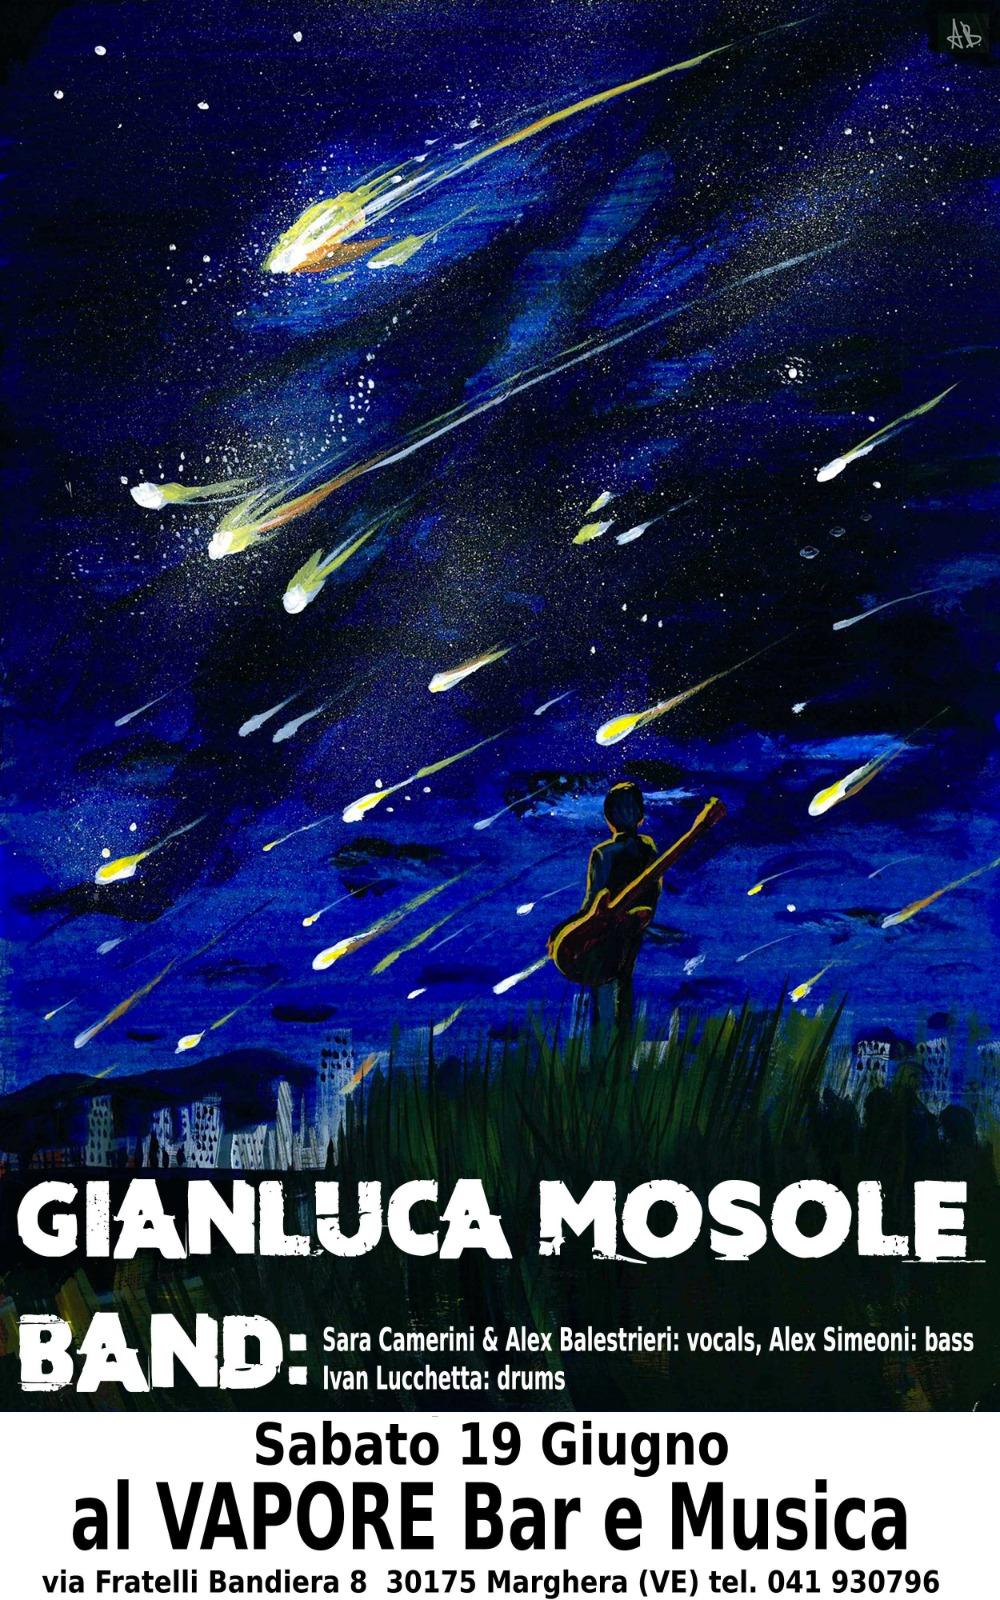 Gianluca Mosole Band